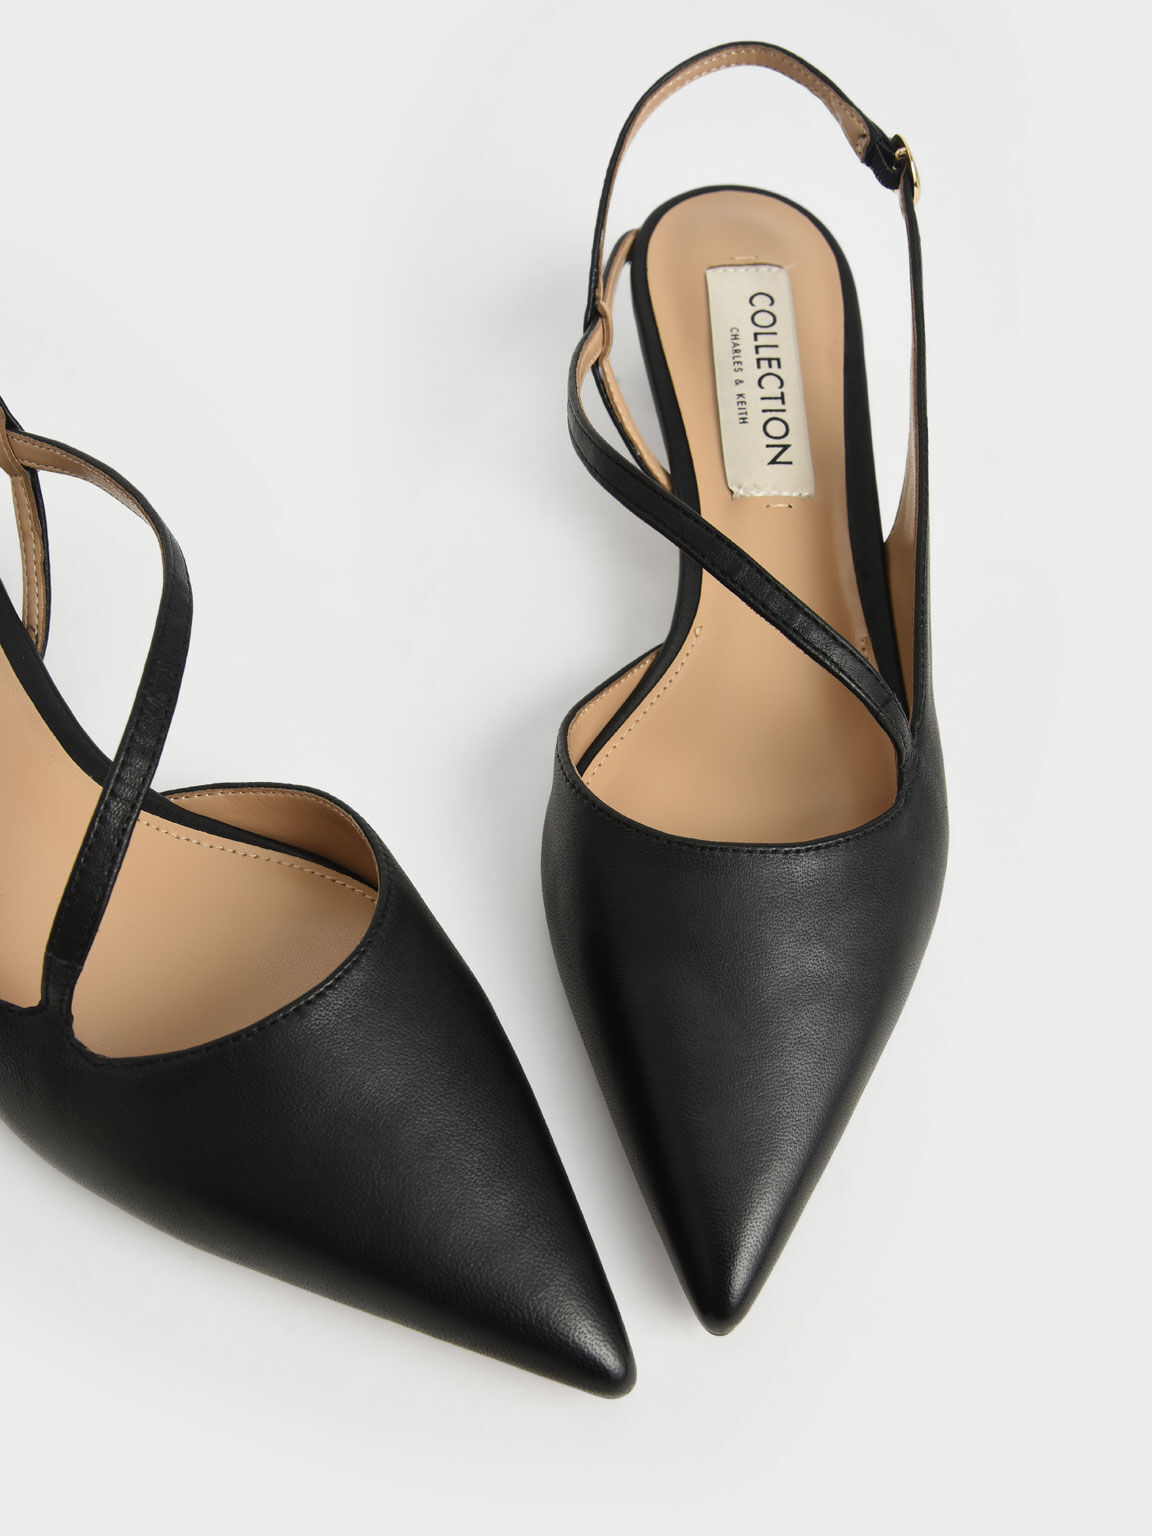 Leather Asymmetric Slingback Pumps, Black, hi-res